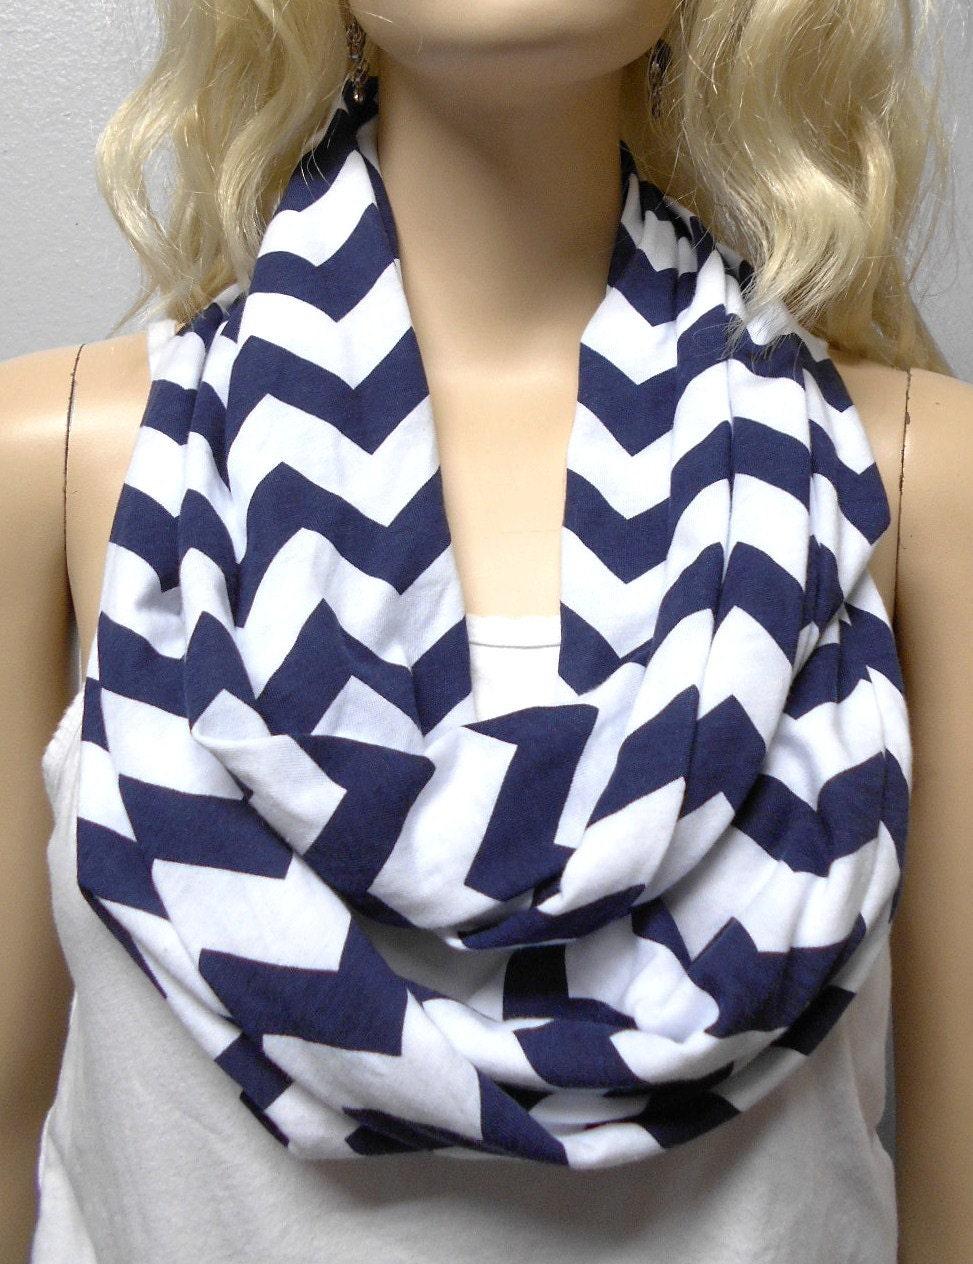 Navy Blue Amp White Chevron Print Infinity Scarf Jersey Knit